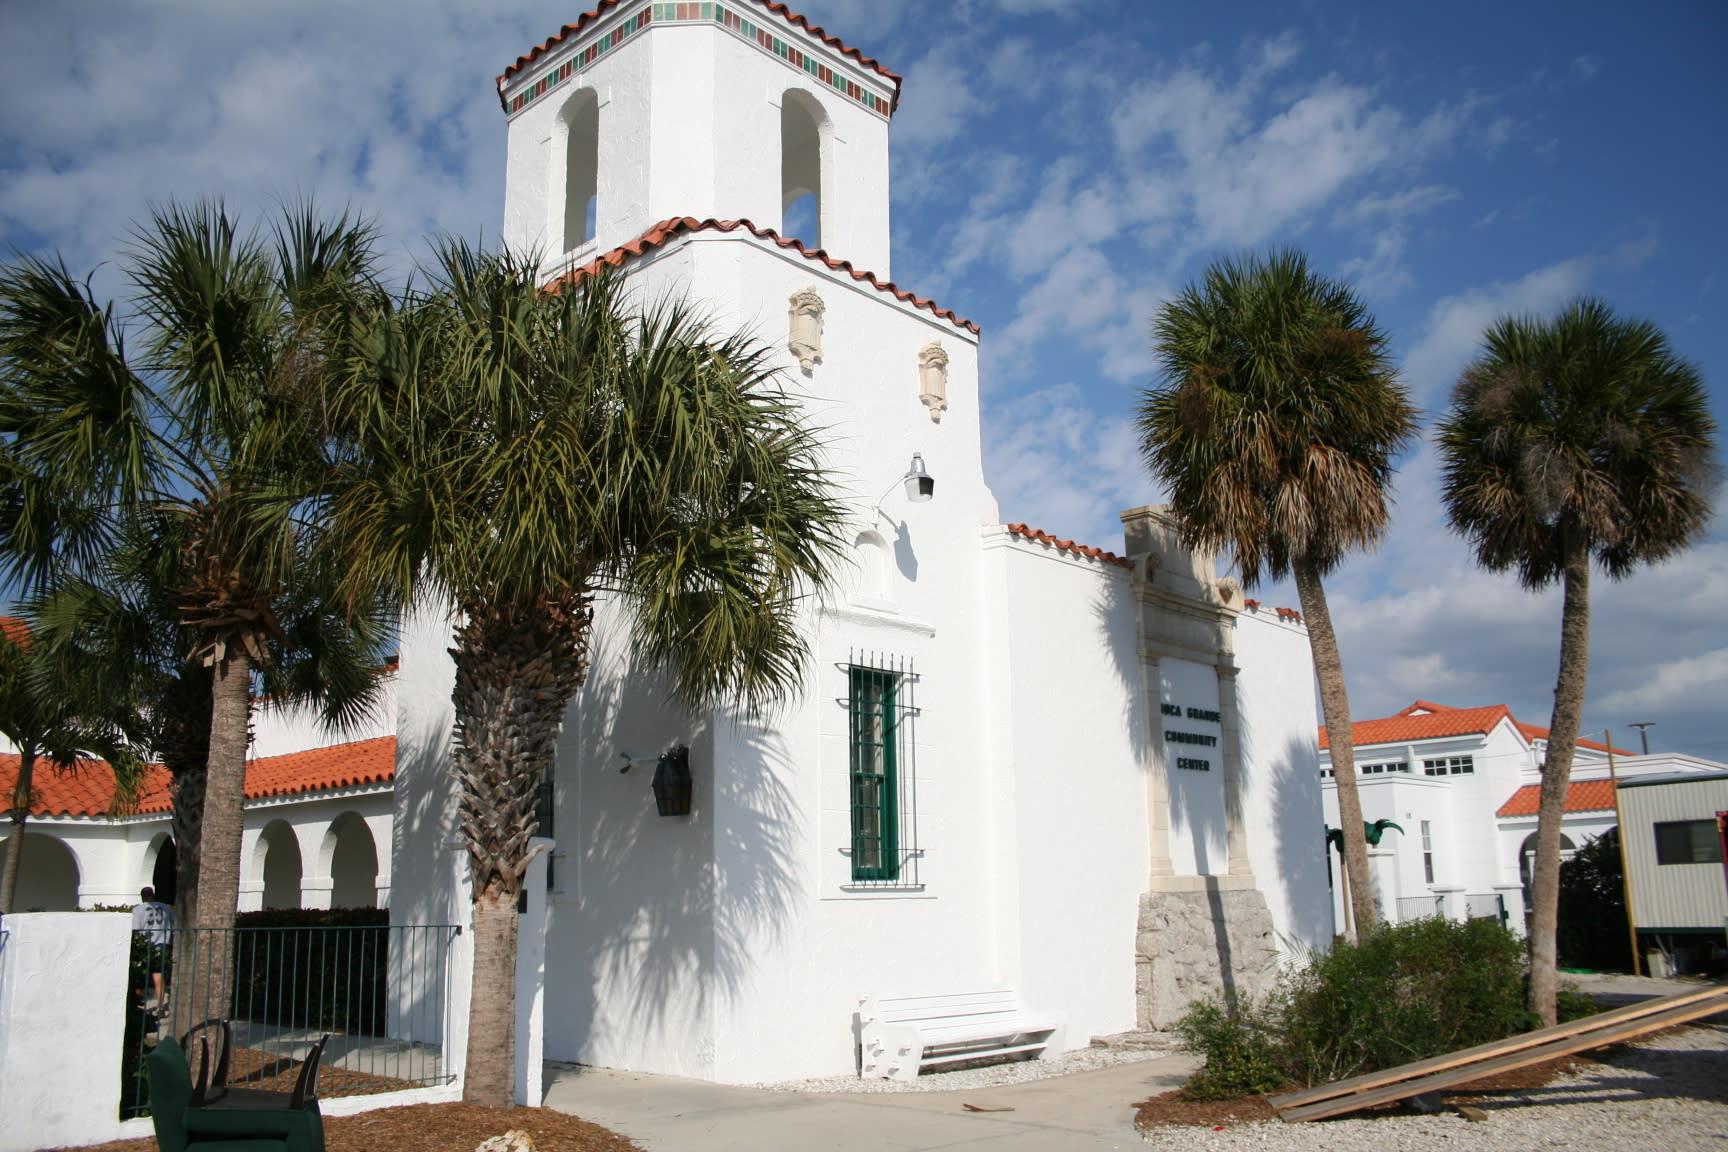 Gulf to Bay Sotheby's International Realty Sponsor the Boca Grande Historical Society's 2021 Virtual House Tour